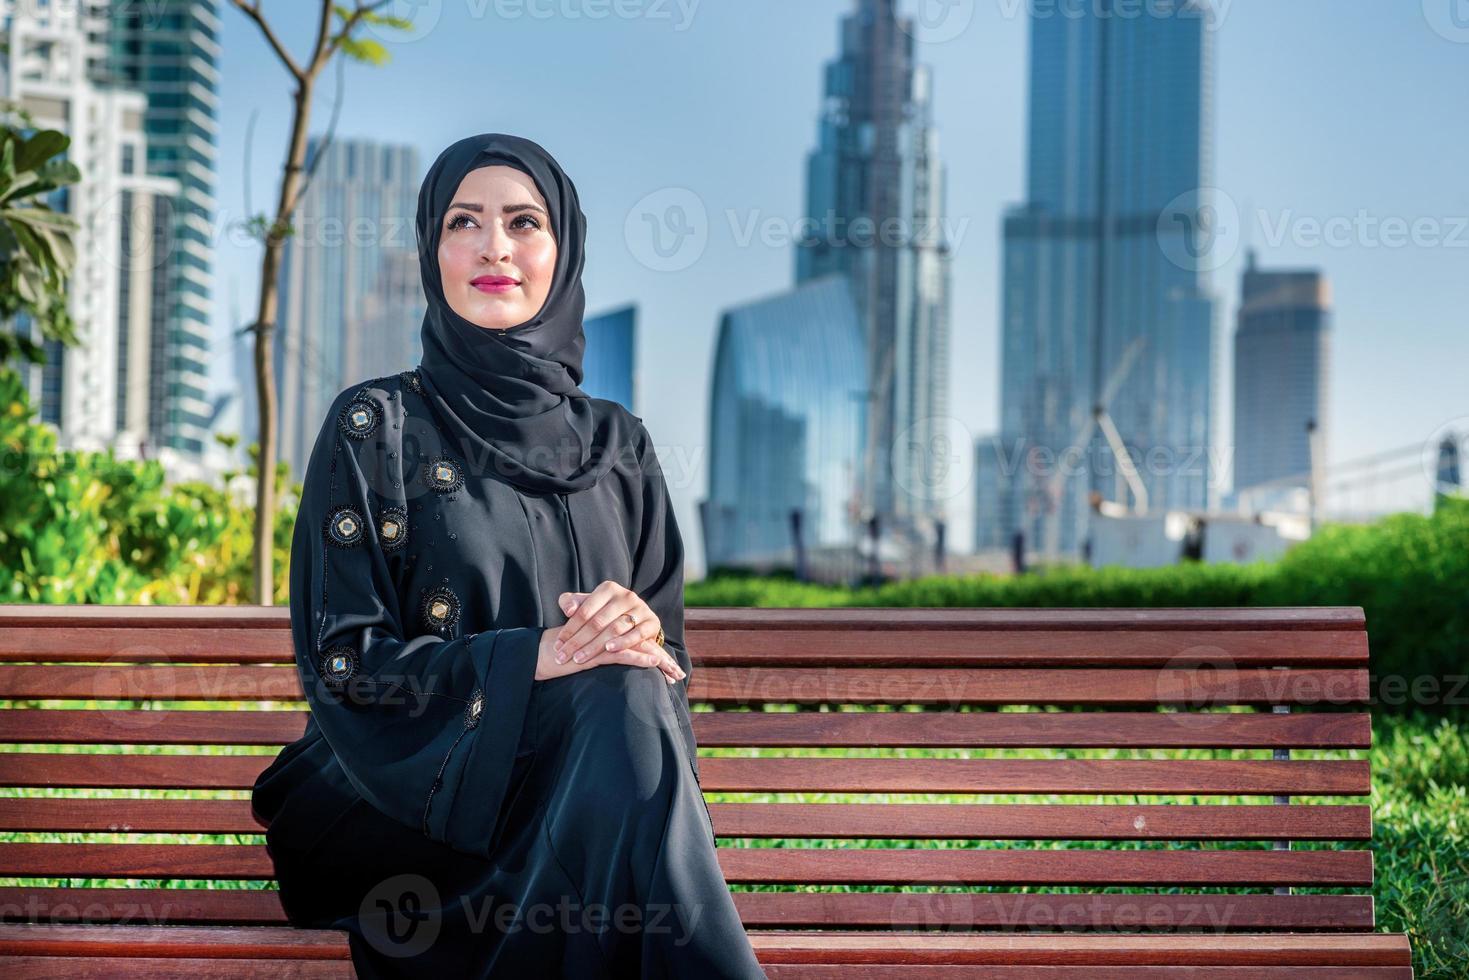 Éxito árabe. Empresarias árabes en hijab sentado en un banco foto